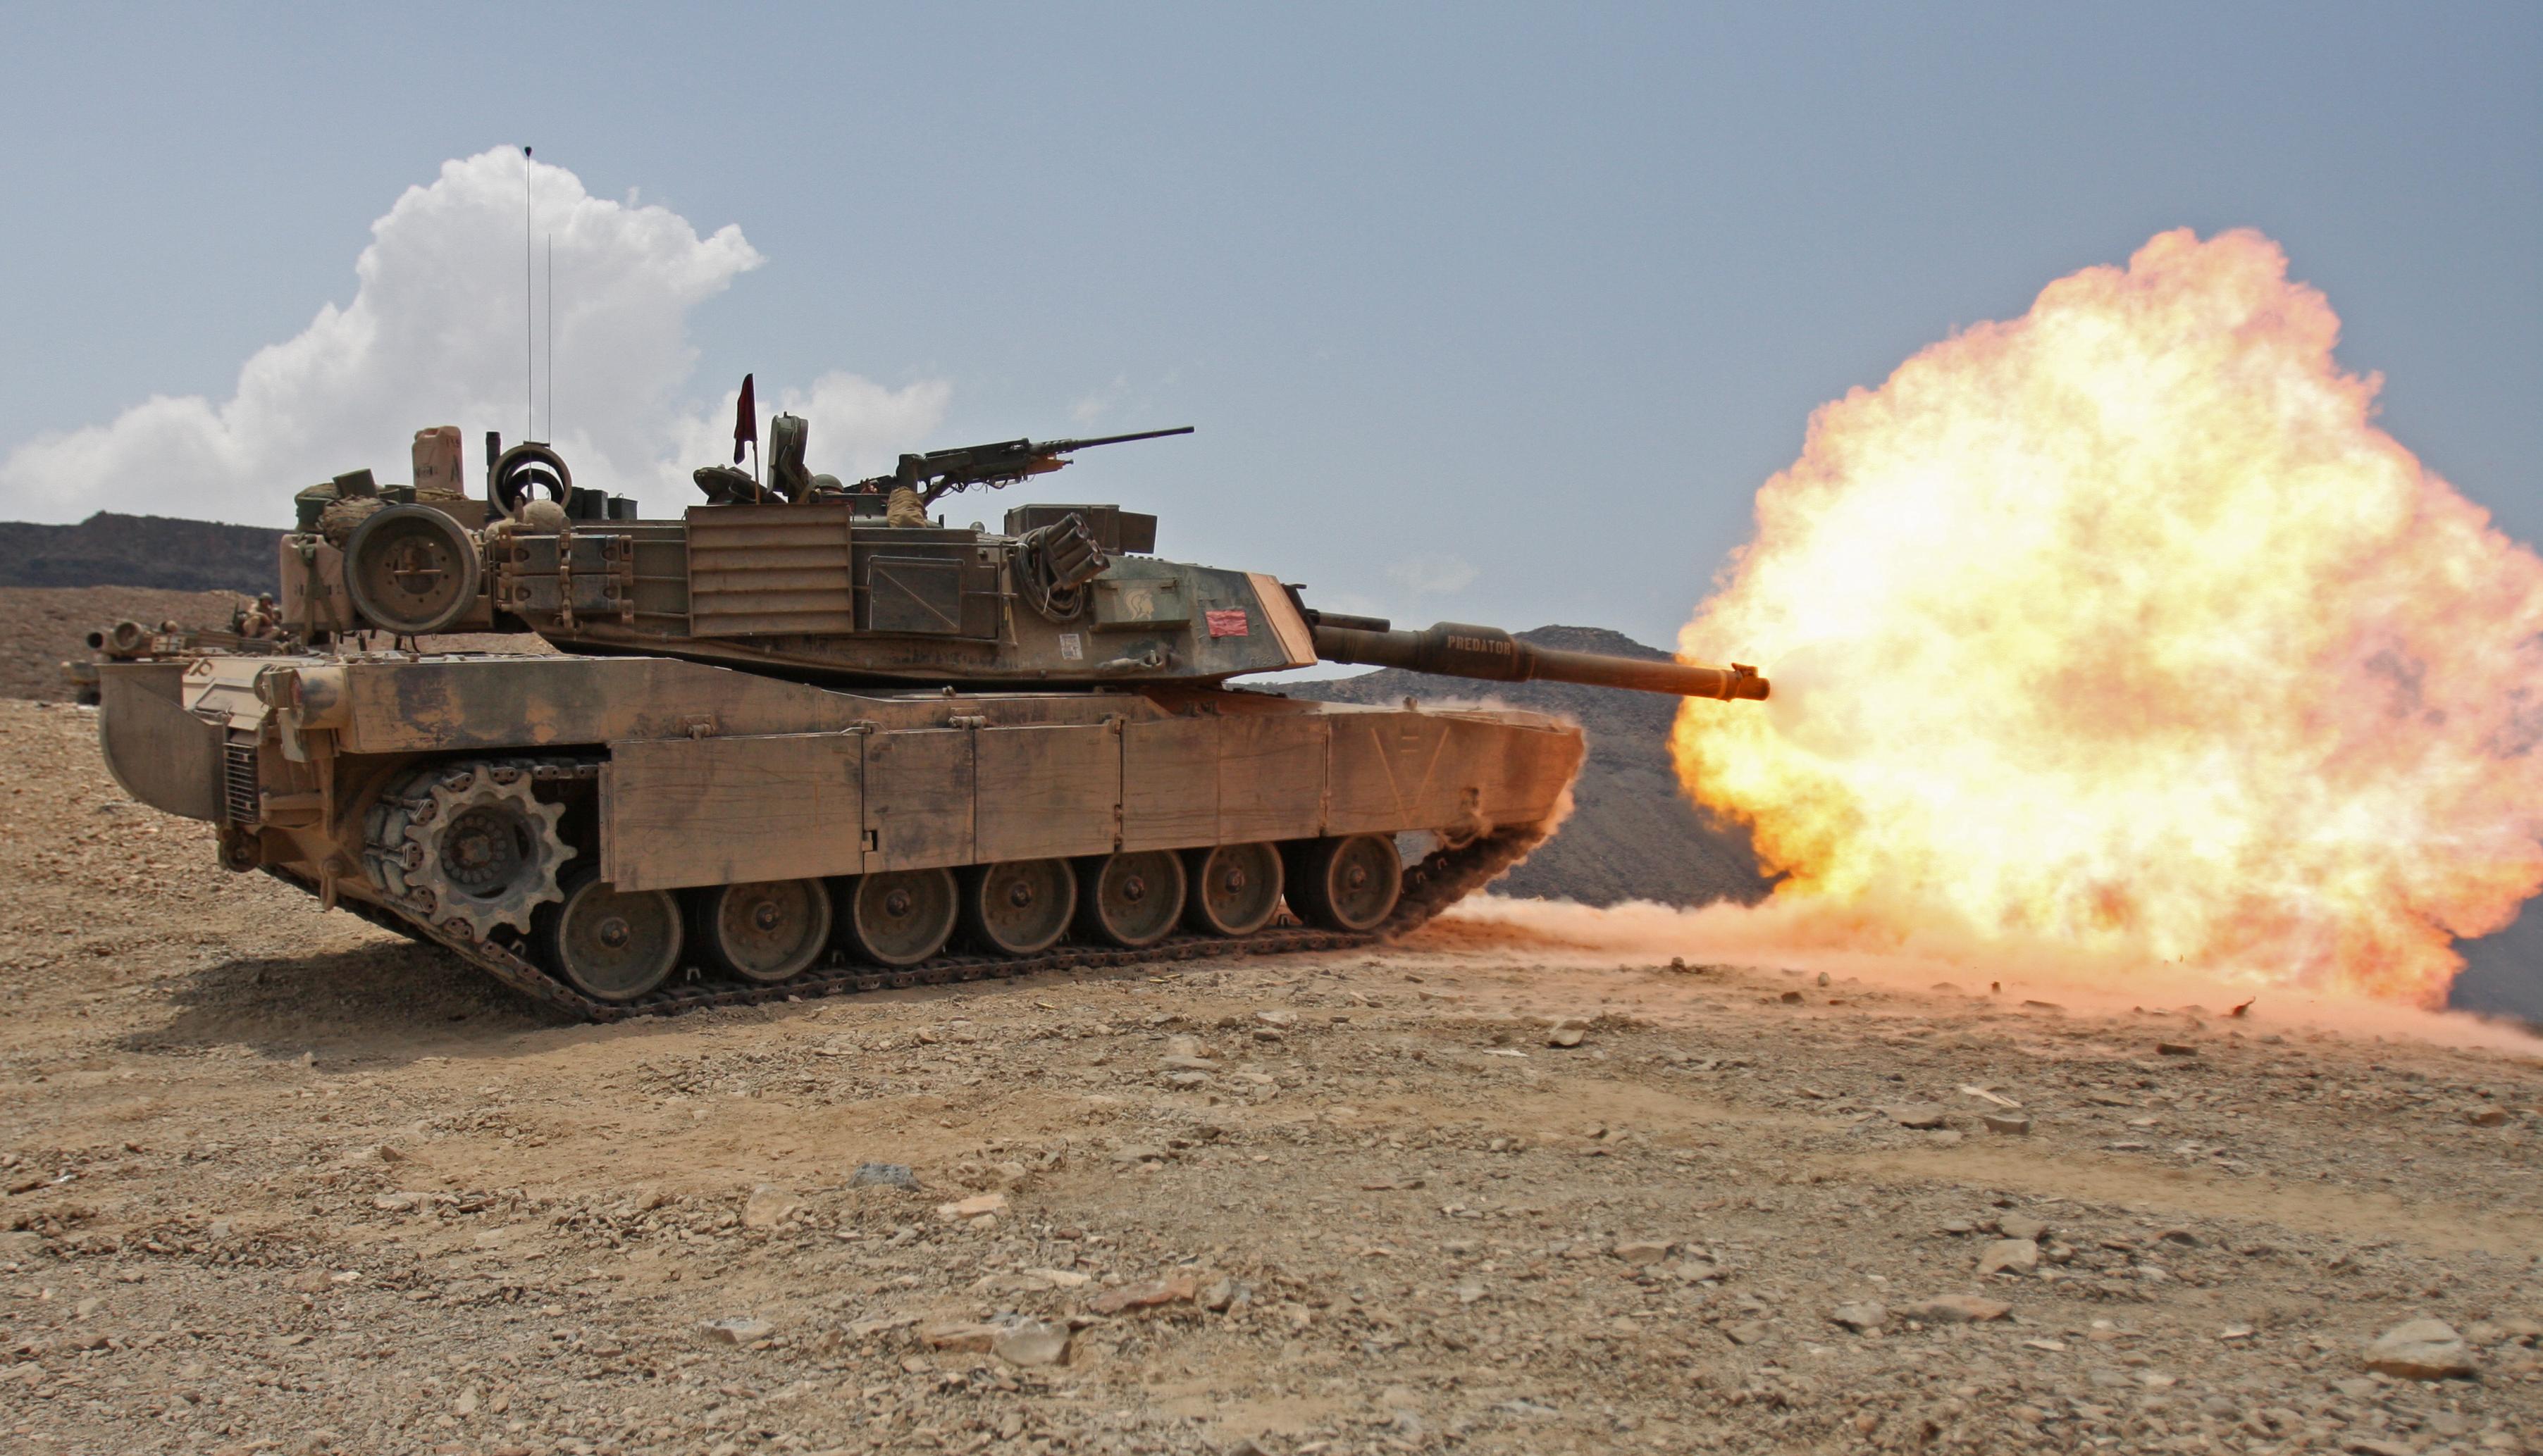 File:Firing M1A1 tank in Djibouti.jpg - Wikimedia Commons